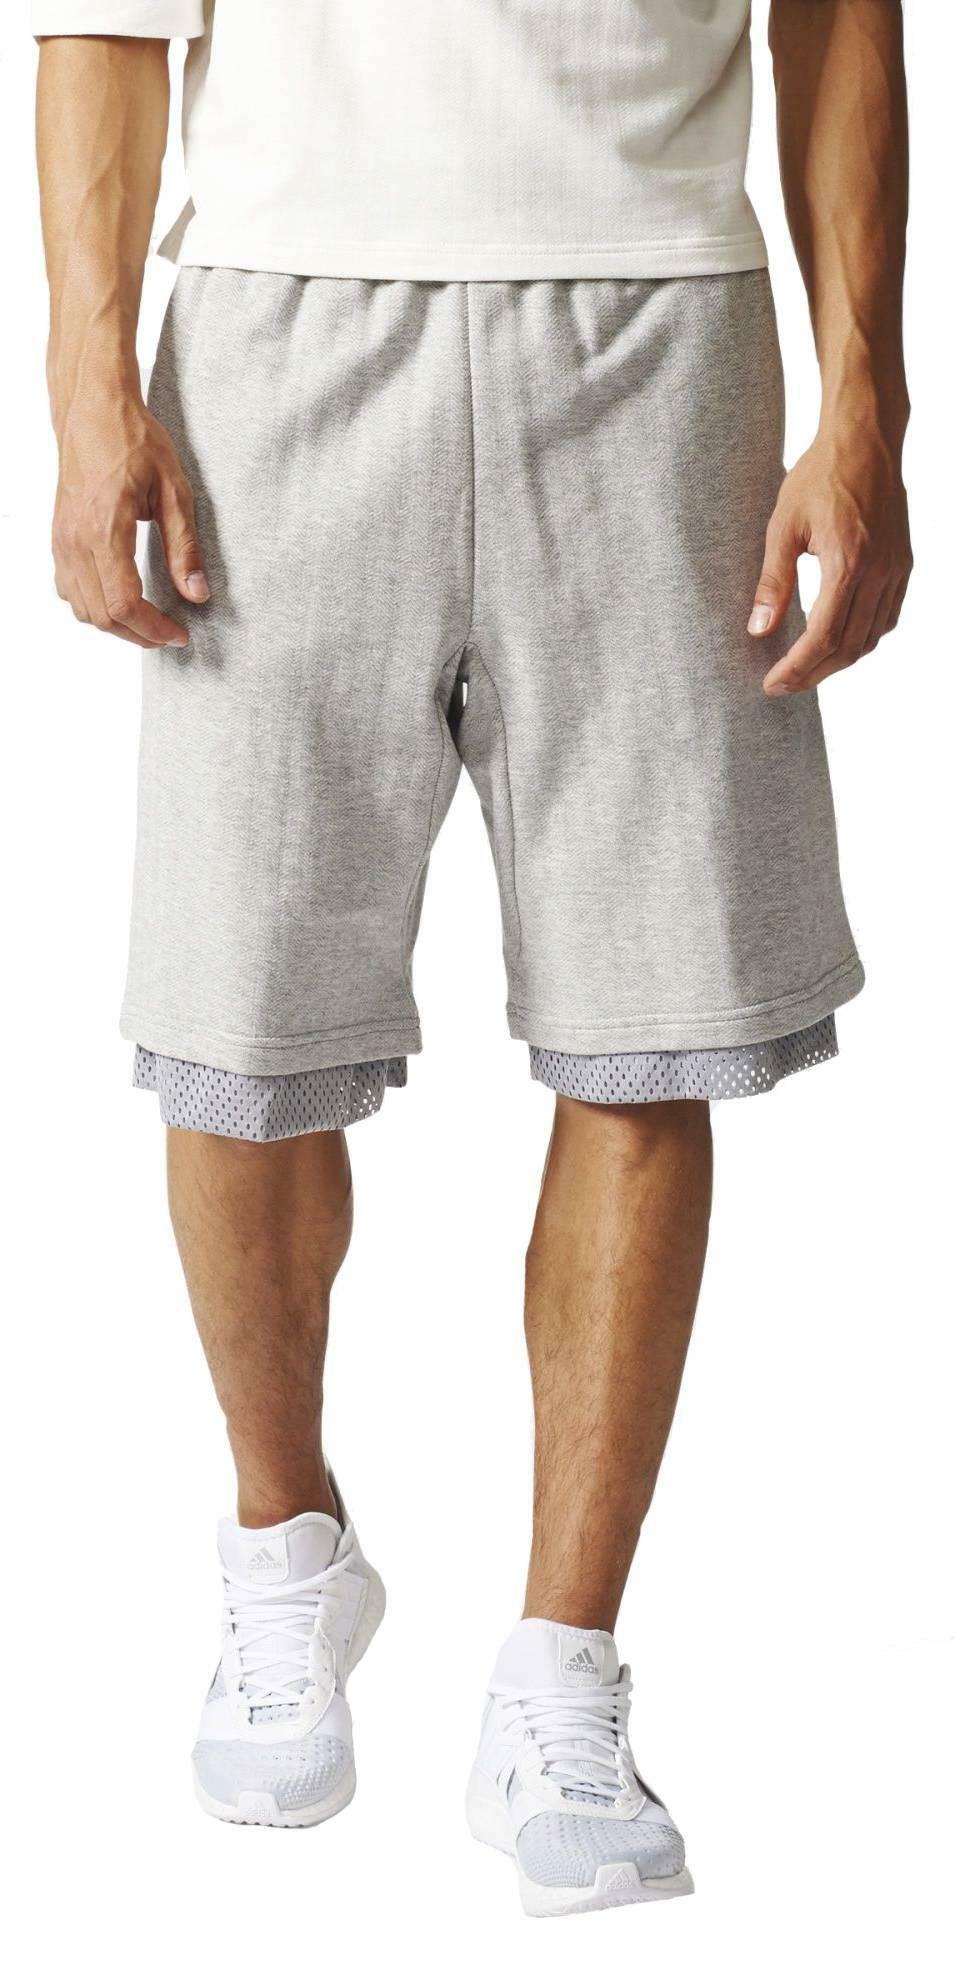 adidas adidas winner stay short pantaloncini grigi uomo reversibili bk7796